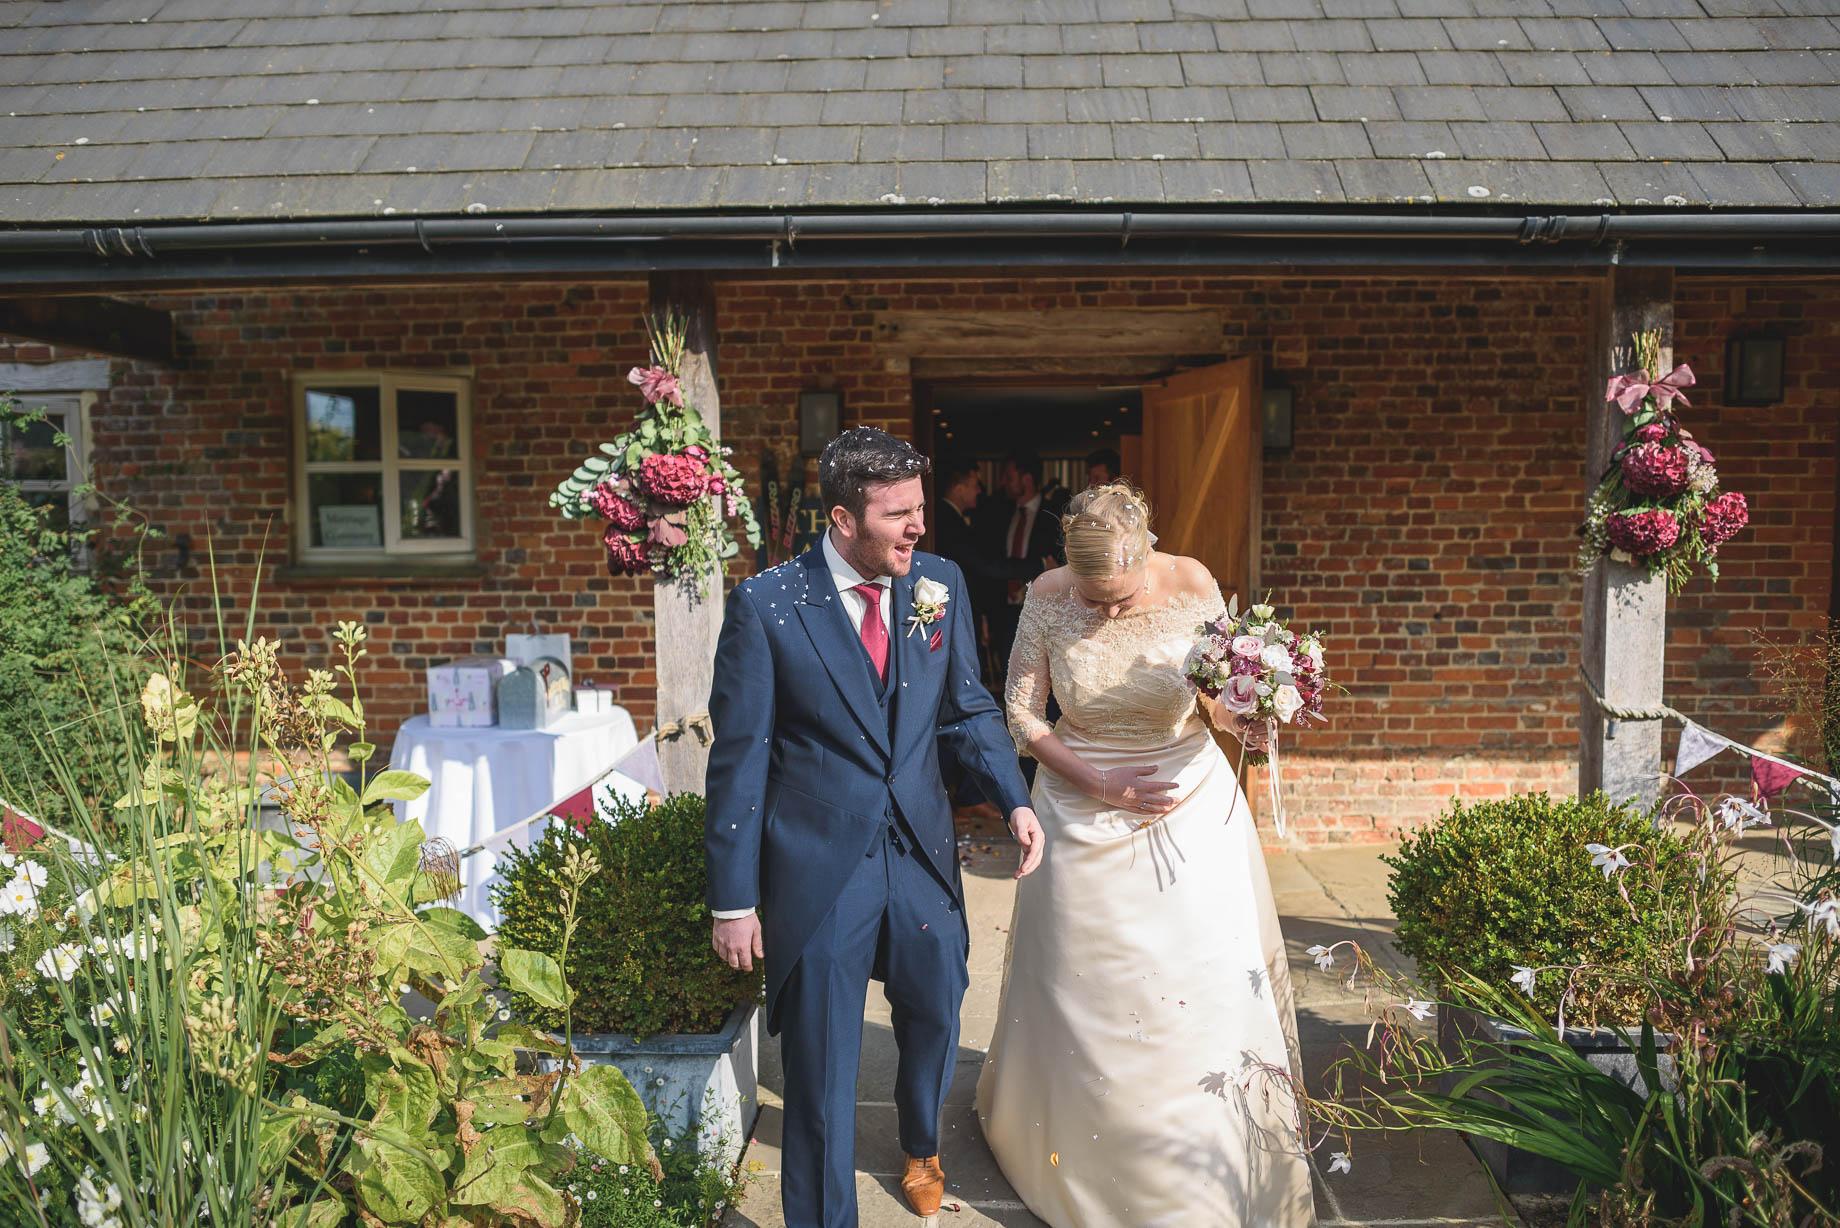 Bury Court Barn wedding photography - Guy Collier - Hannah and Mark (77 of 191)